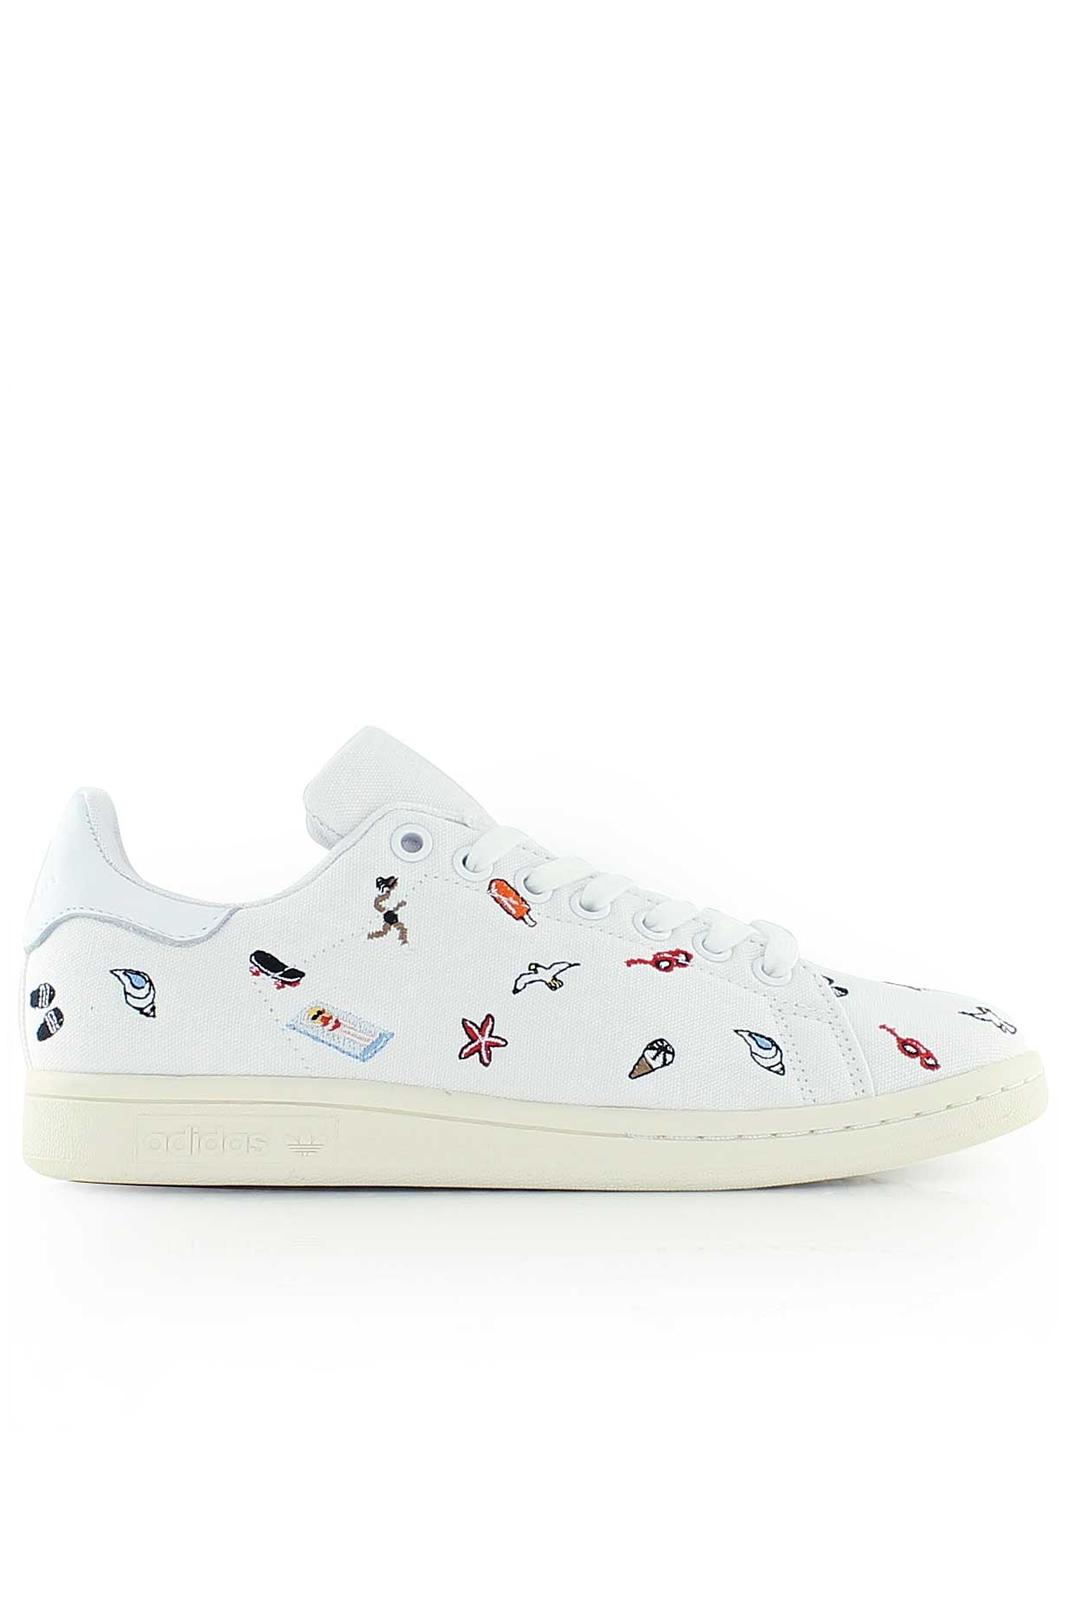 Baskets / Sneakers  Adidas BZ0392 STAN SMITH BLANC